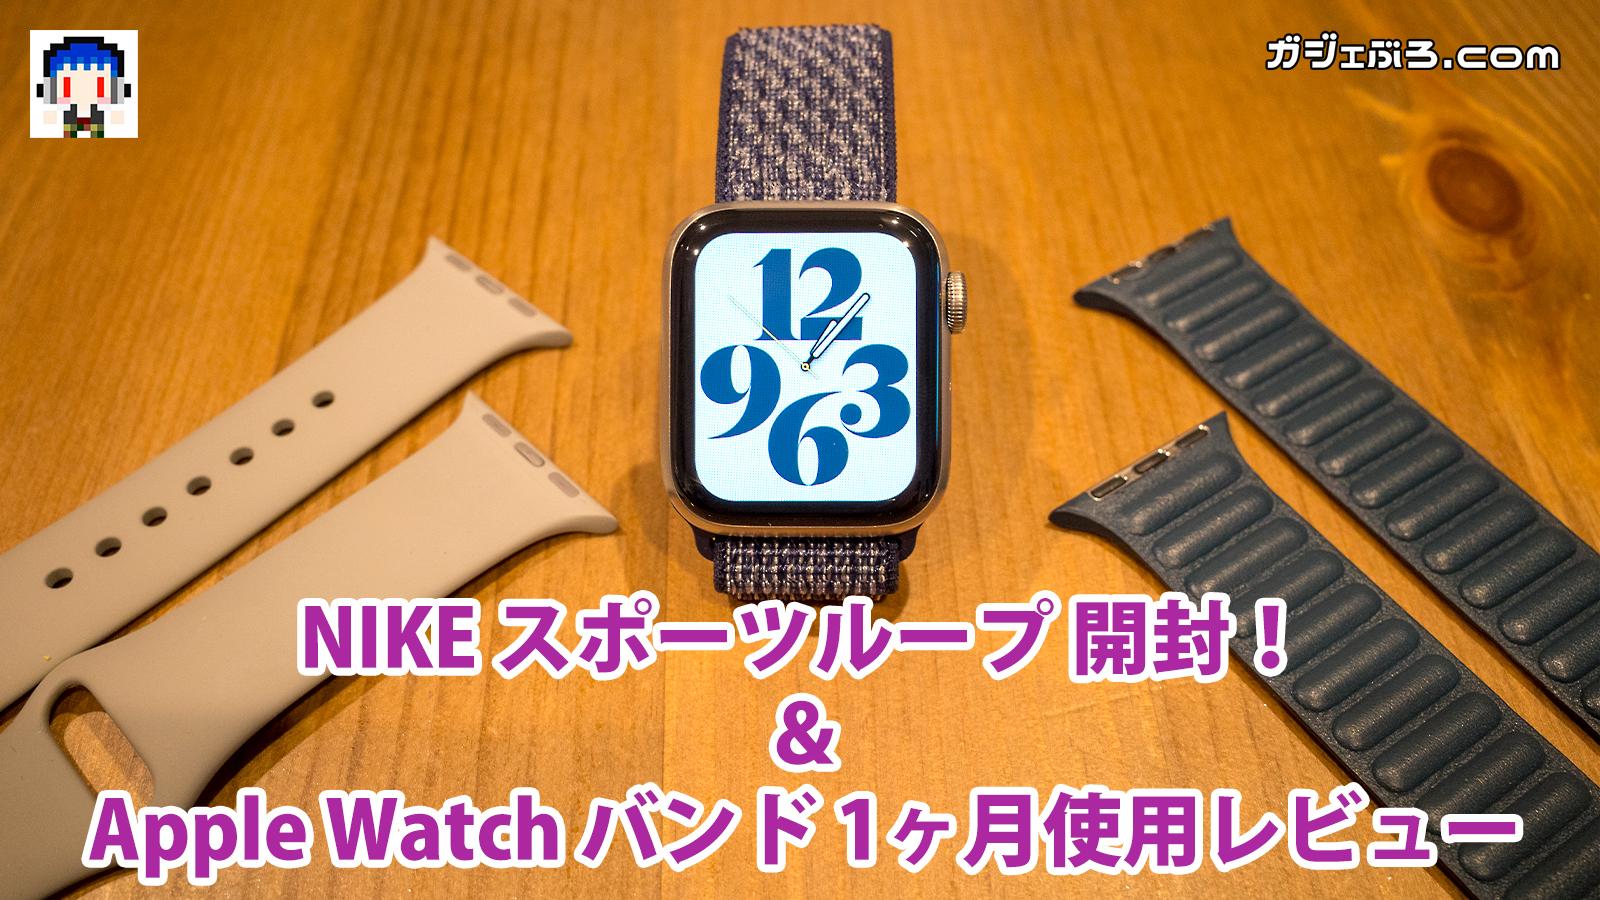 NIKE スポーツループ開封!& Apple Watchバンド 1ヶ月使用レビュー